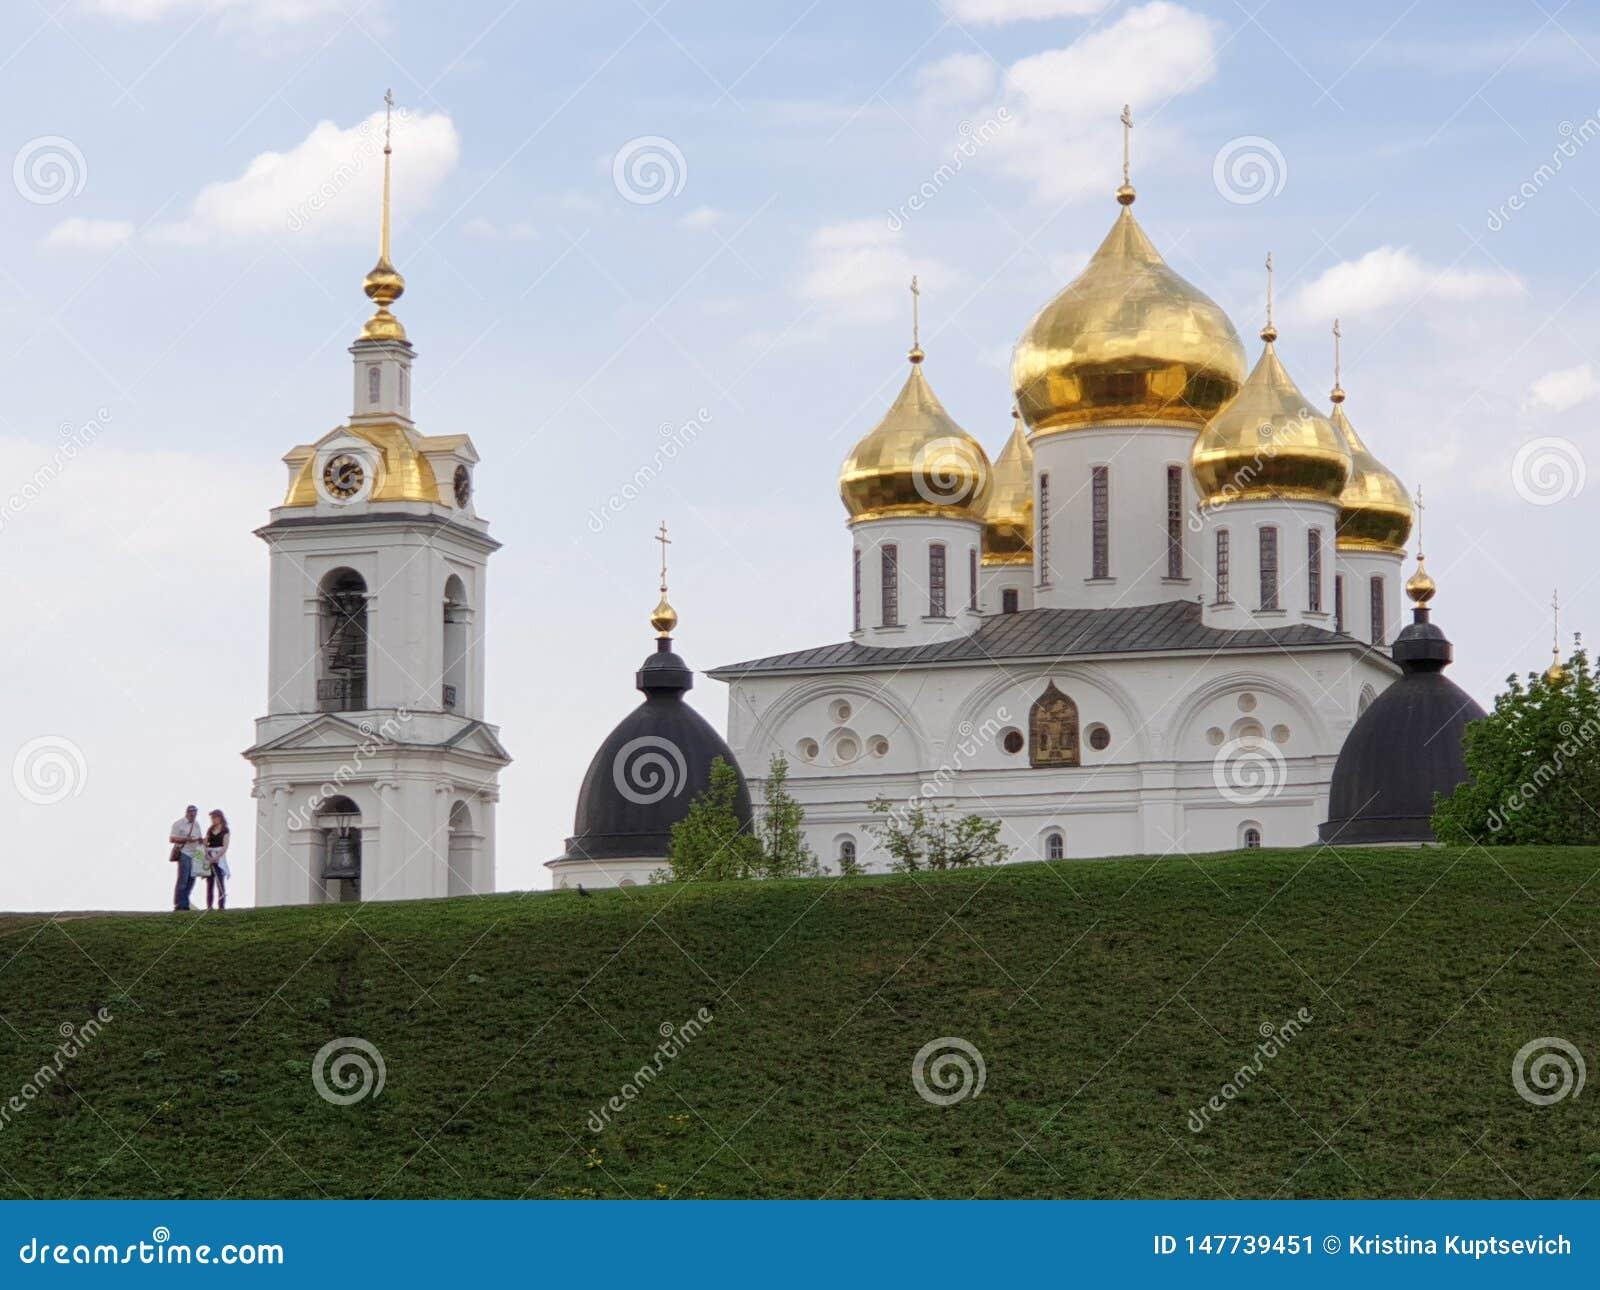 Dmitrov Russland - 10. Mai 2019: Dmitrov der Kreml